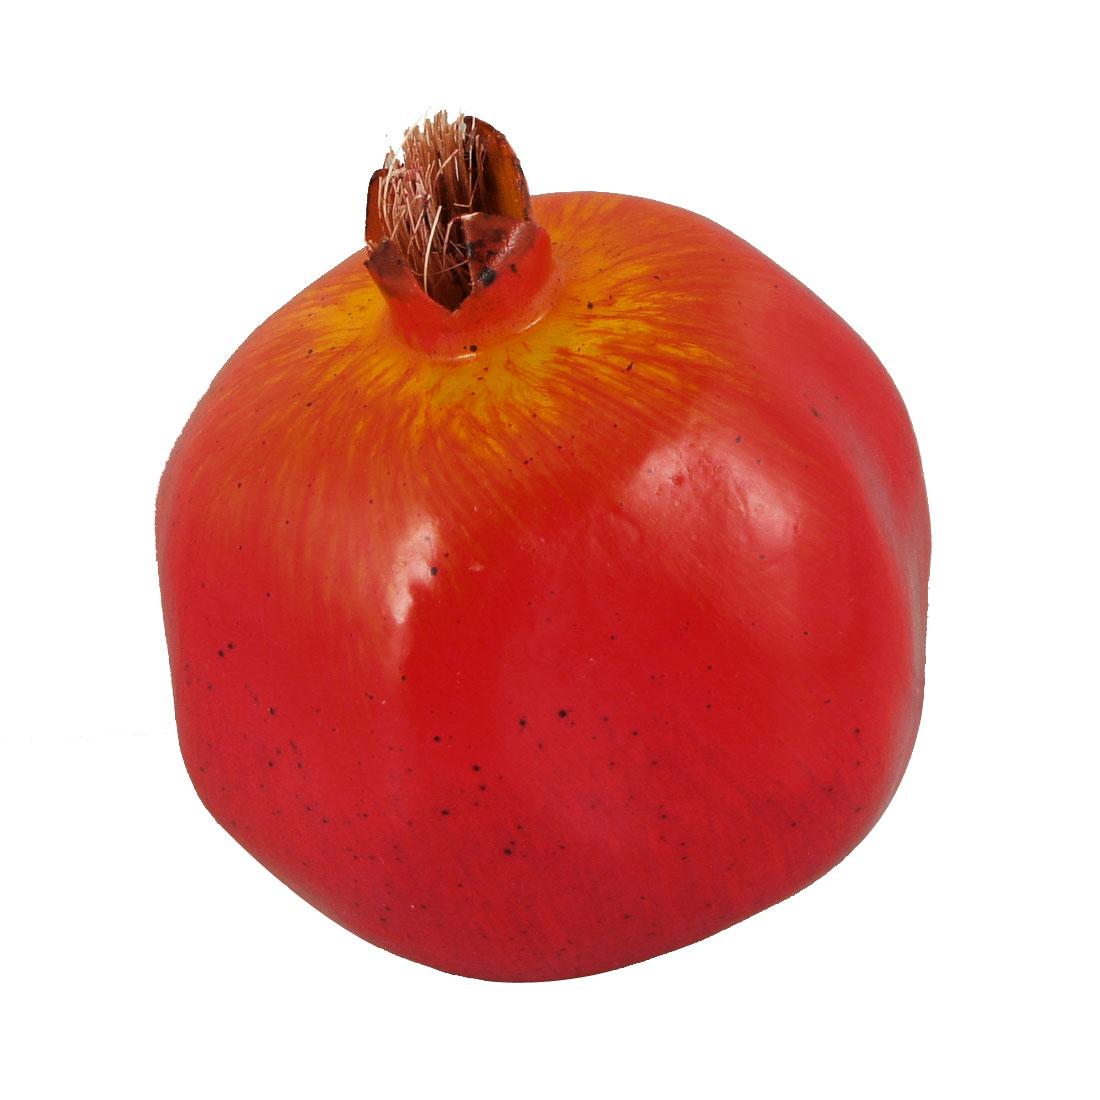 Home Desk Emulational Foam Pomegranate Imitate Fruit Decor Red